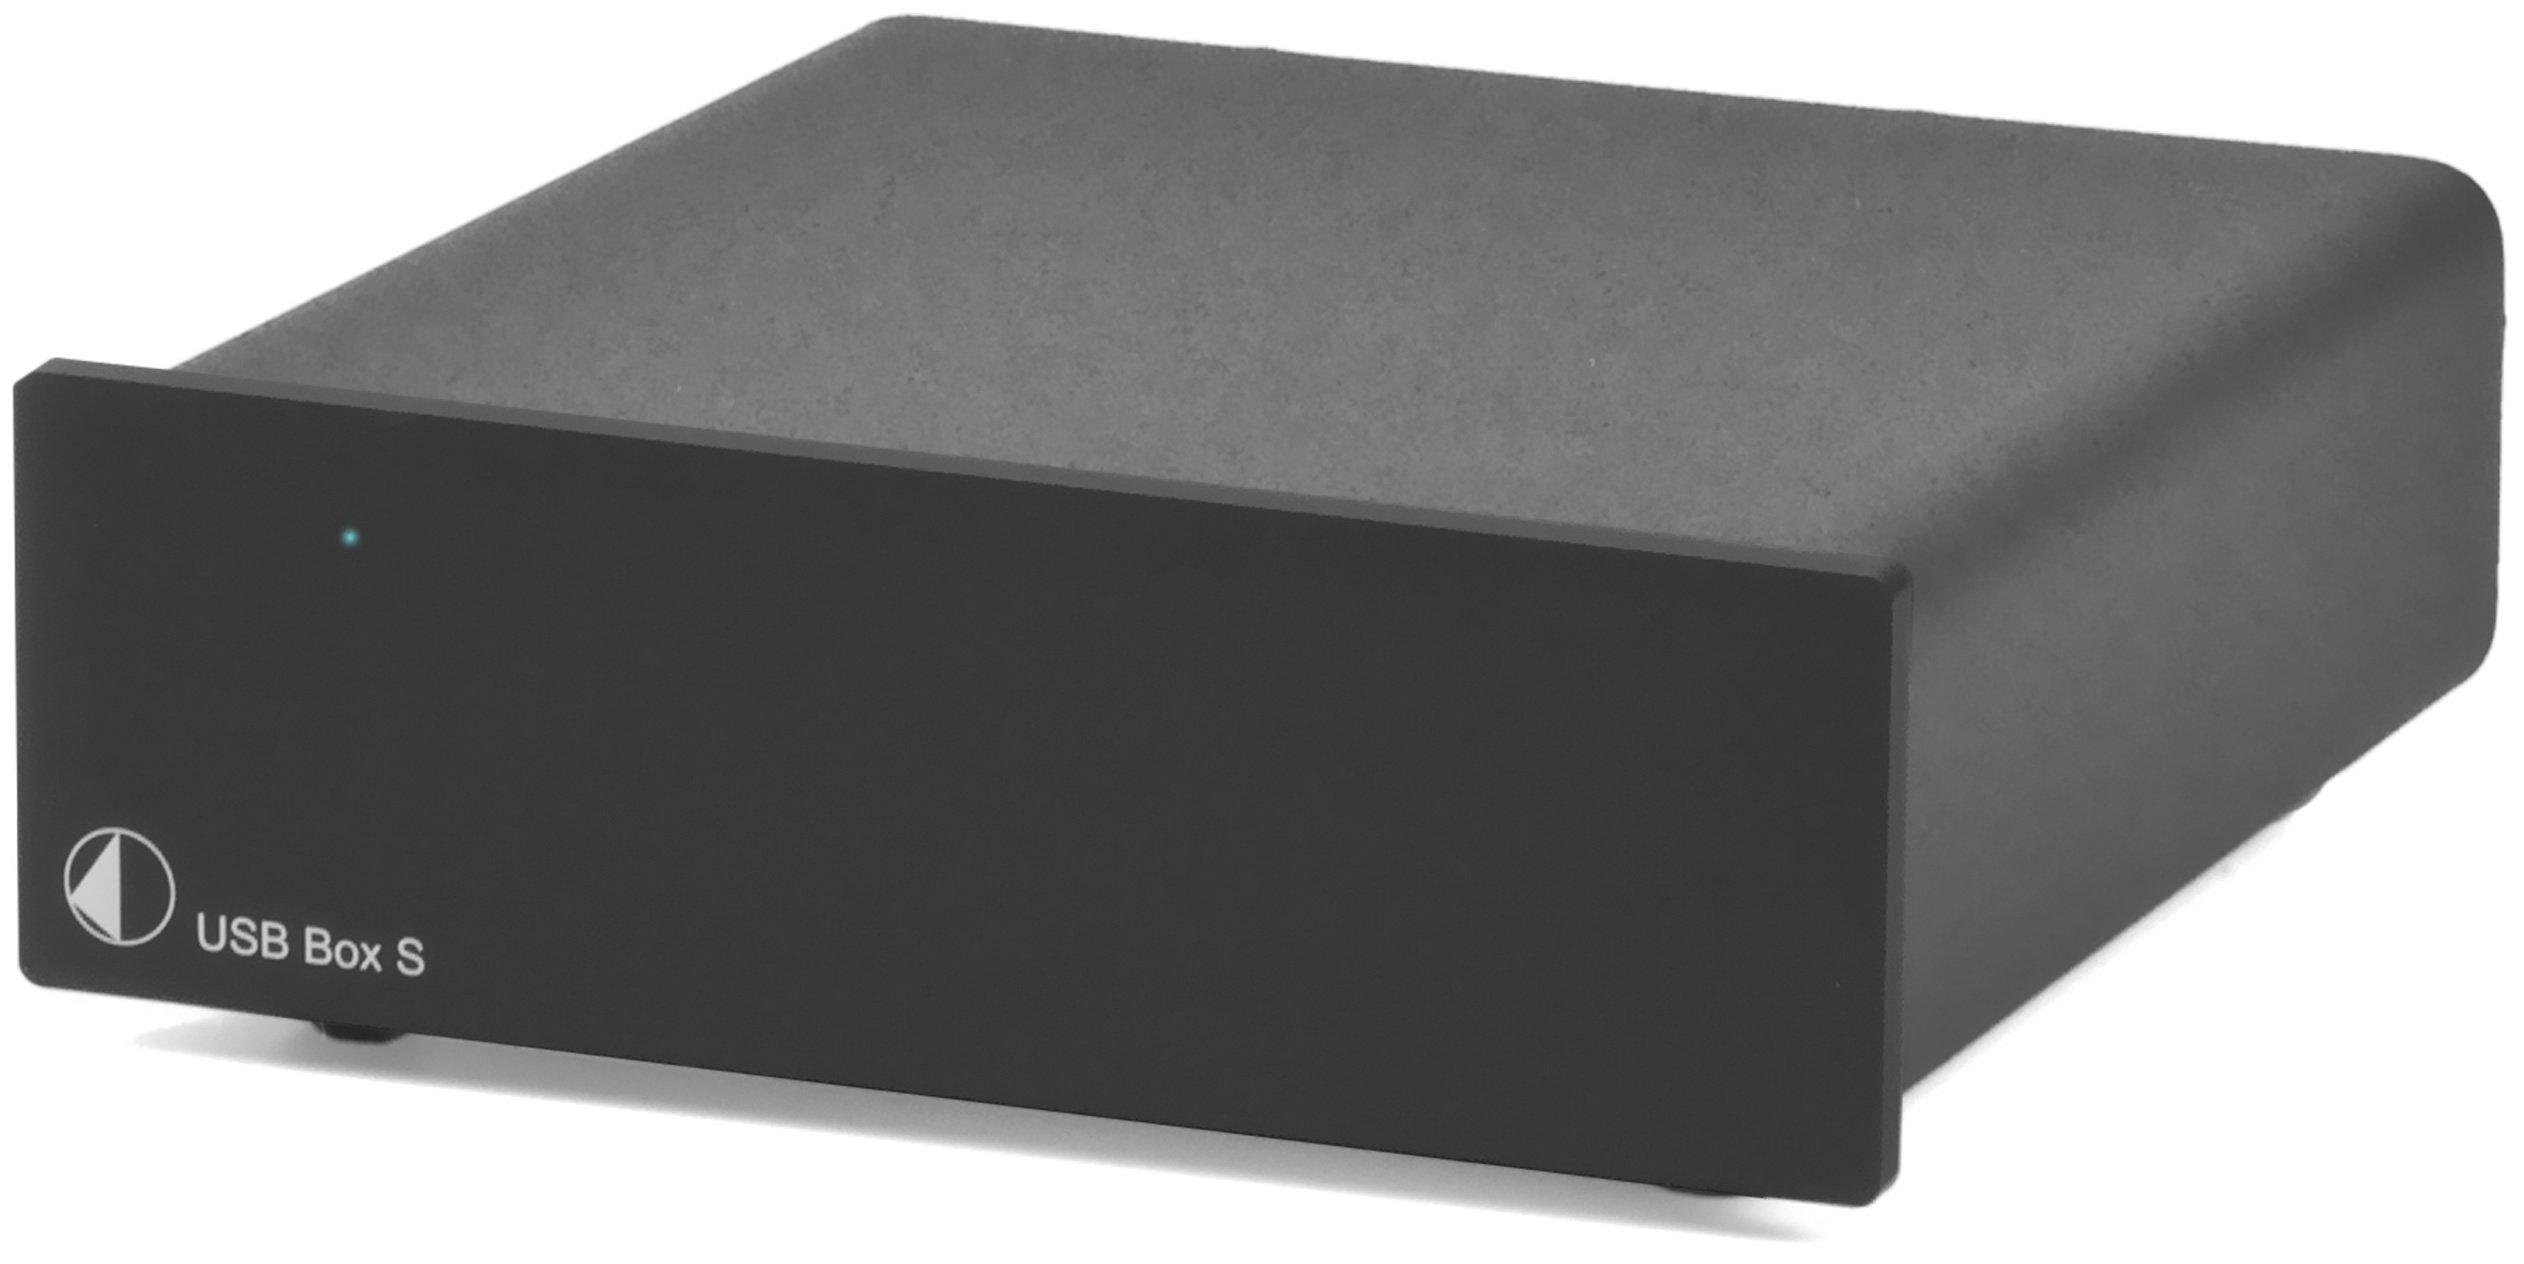 Pro-Ject USB Box S (black) Digital To Analog Converter, Black